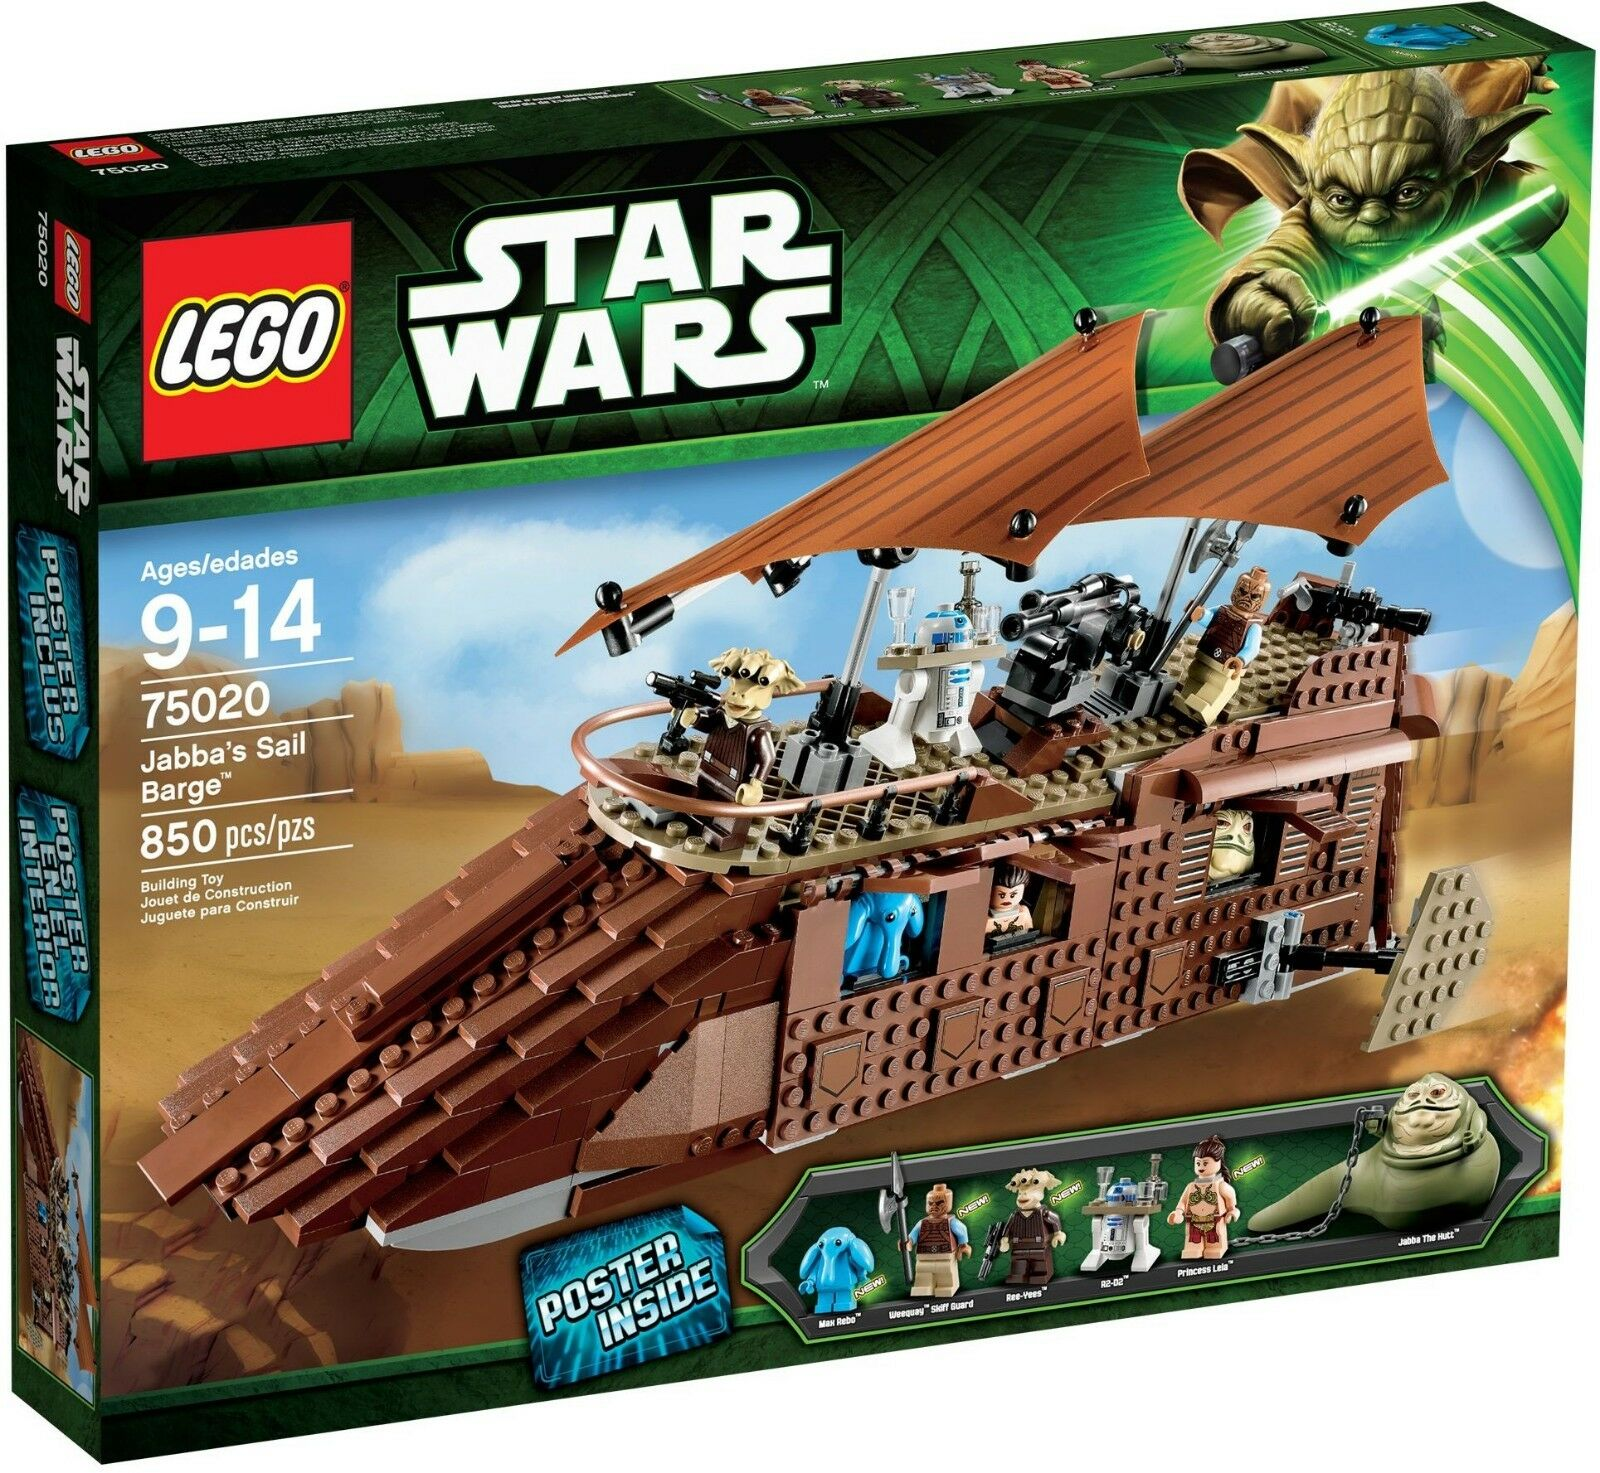 LEGO 75020 JABBA'S SAIL BARGE STAR WARS EPISODE EPISODE EPISODE VI 6 BRAND NEW RETIRED FAST SHIP efdf21